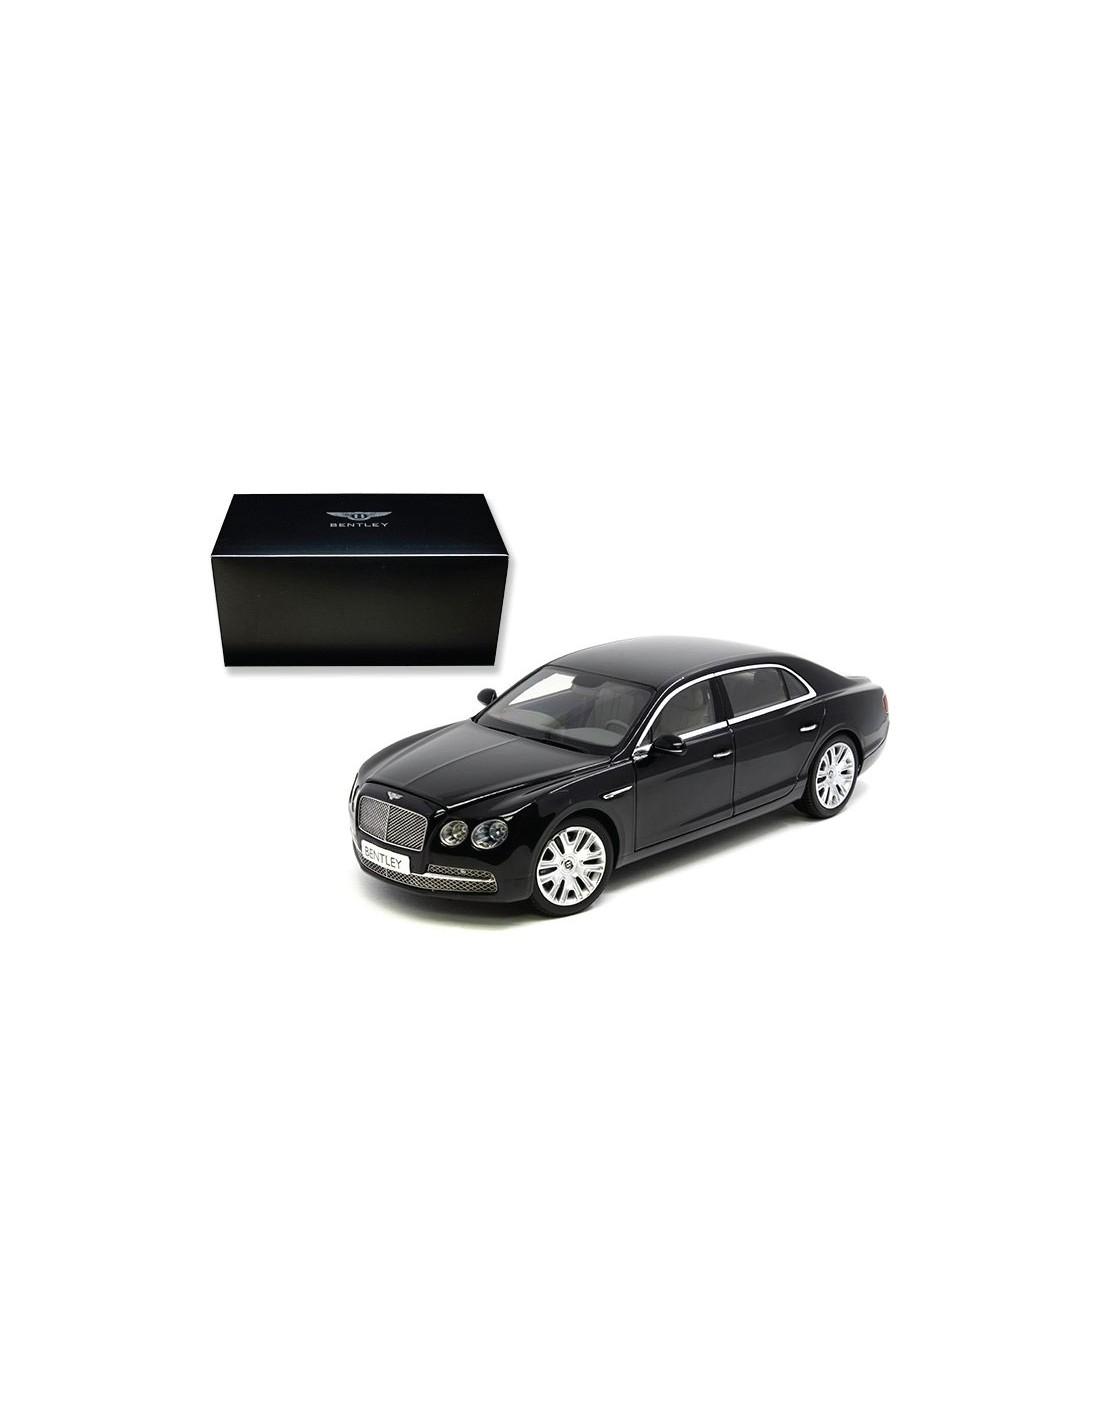 2012 Bentley Flying Spur W12 Diamond Black